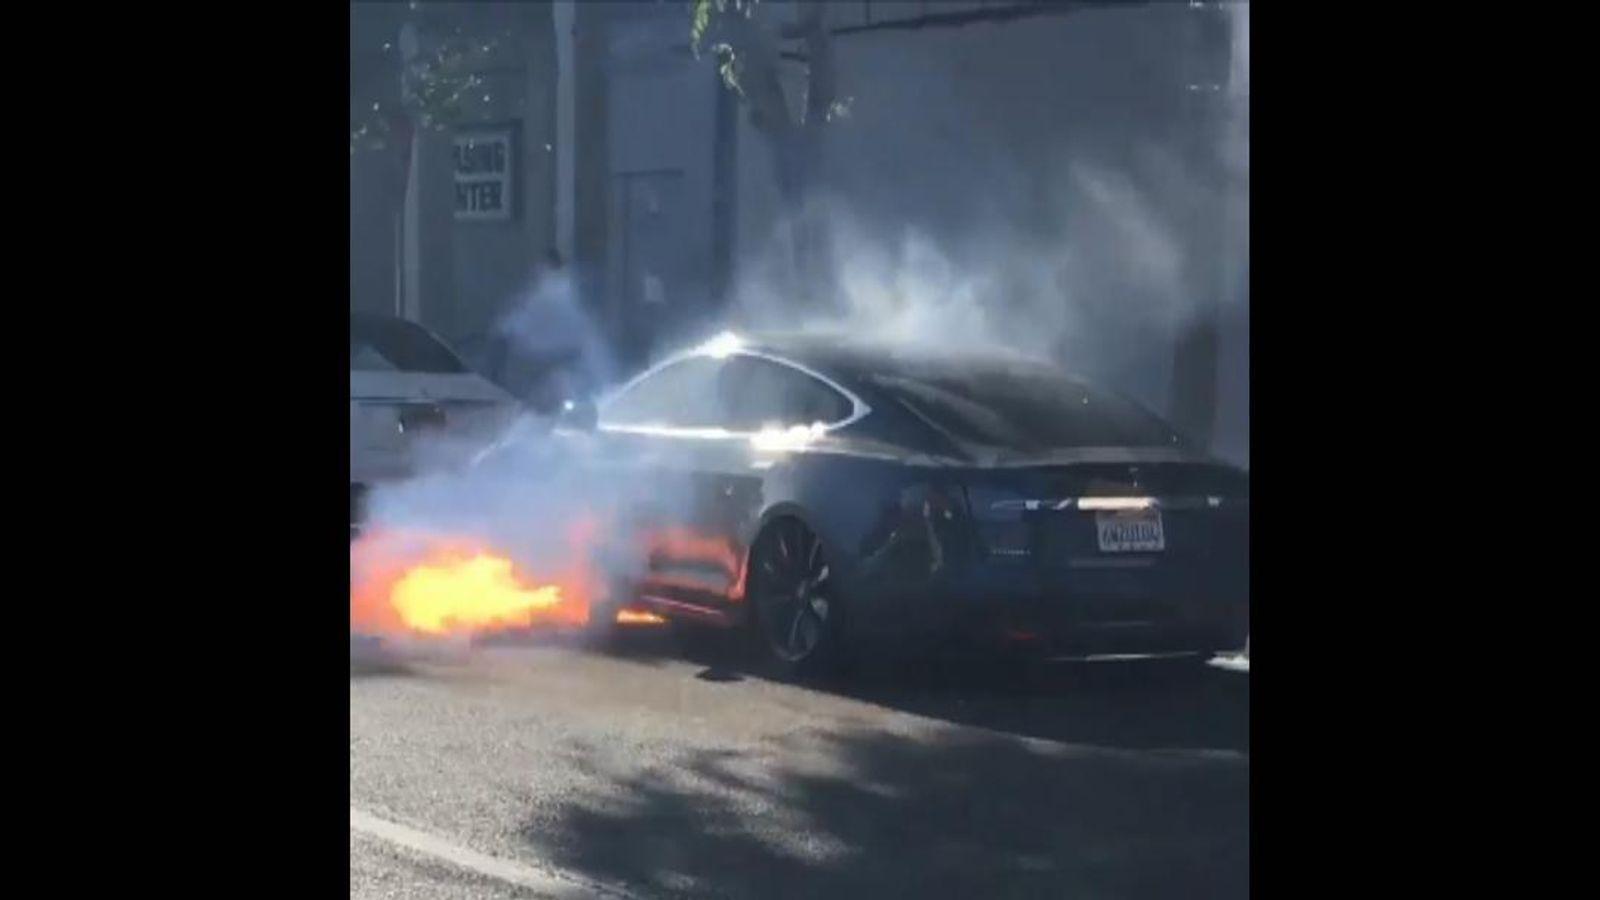 Tesla Model S Fire Filmed By Actress News Uk Video News